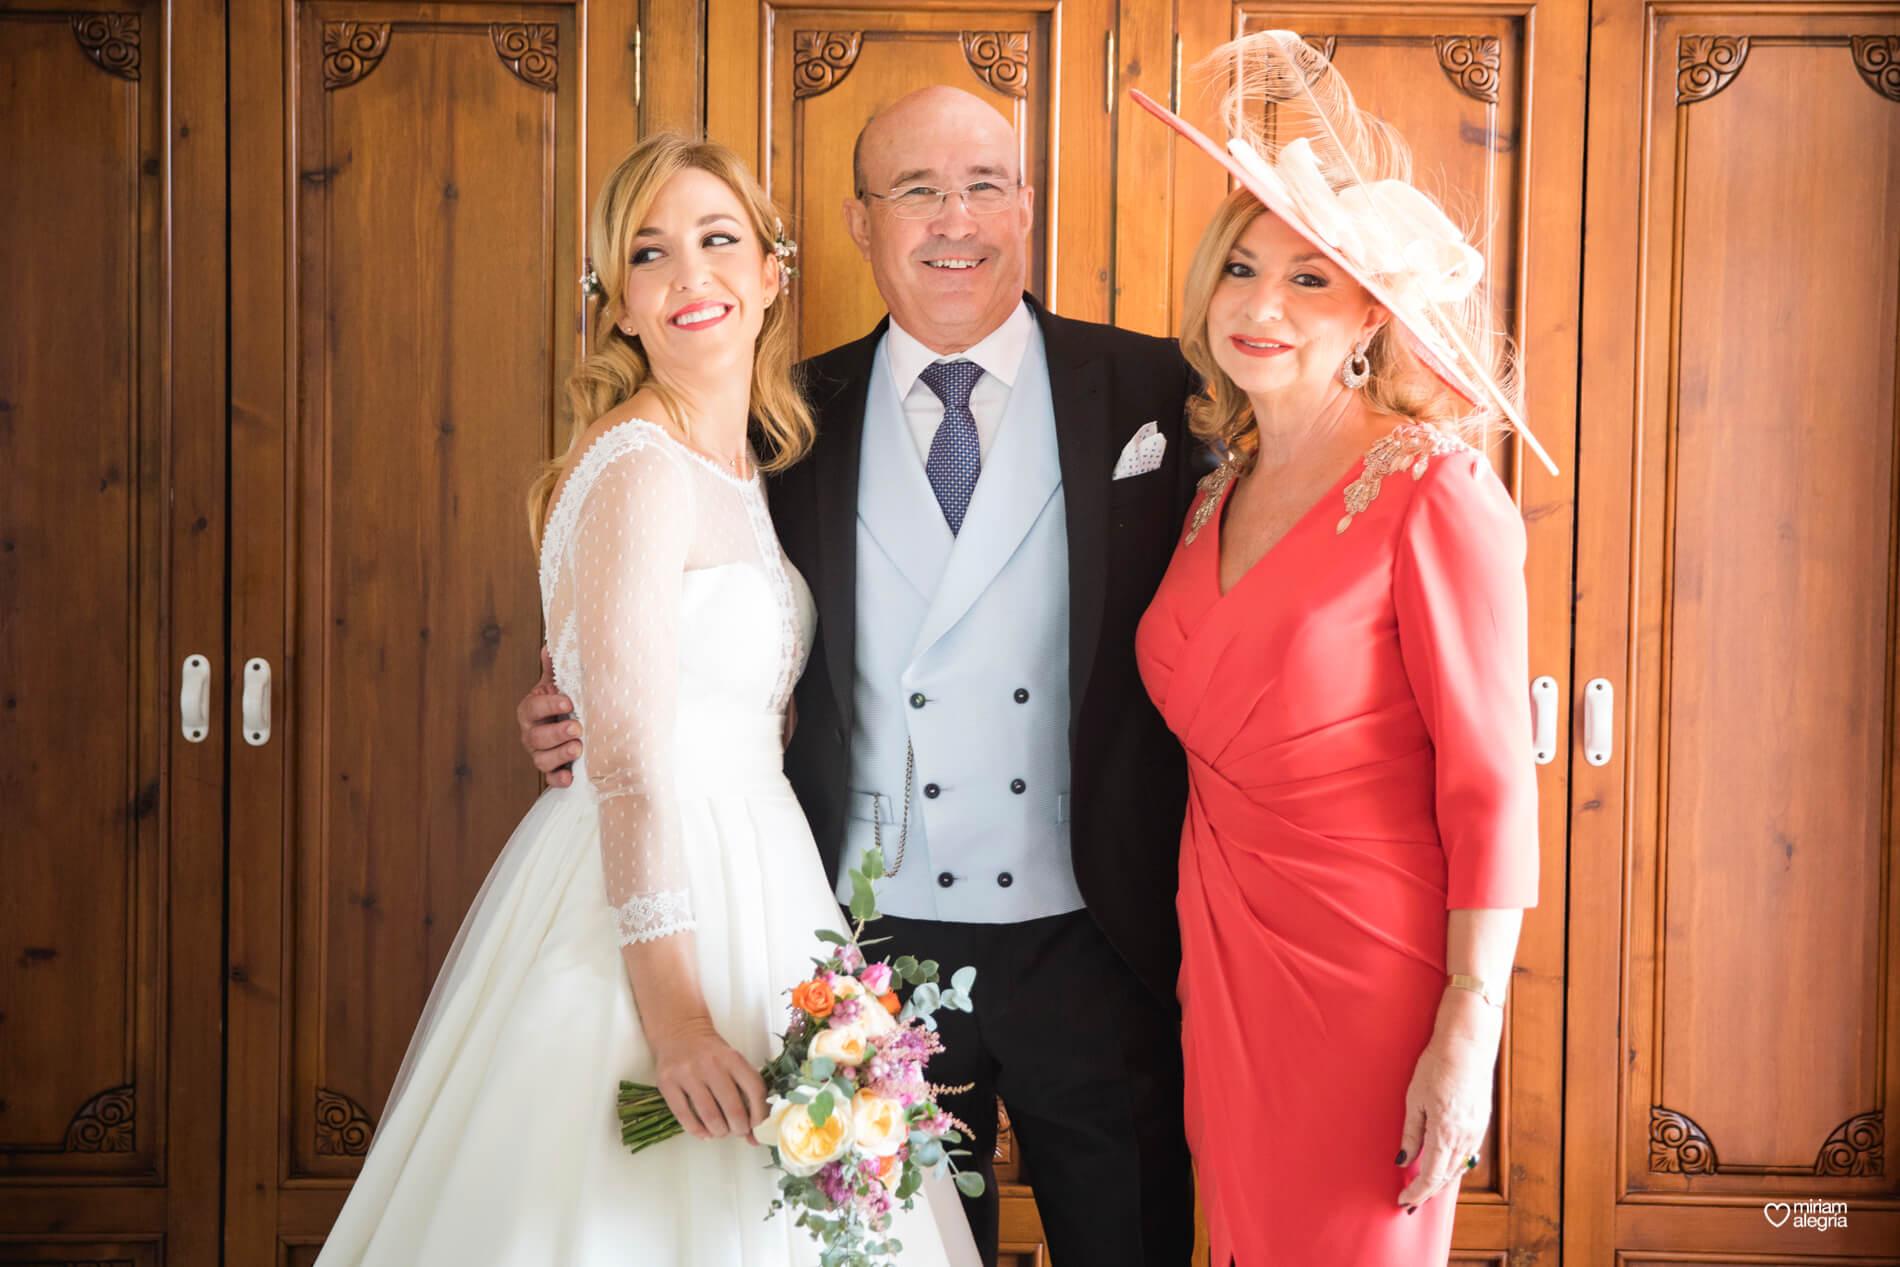 la-boda-de-alemc7-miriam-alegria-fotografos-boda-murcia-37